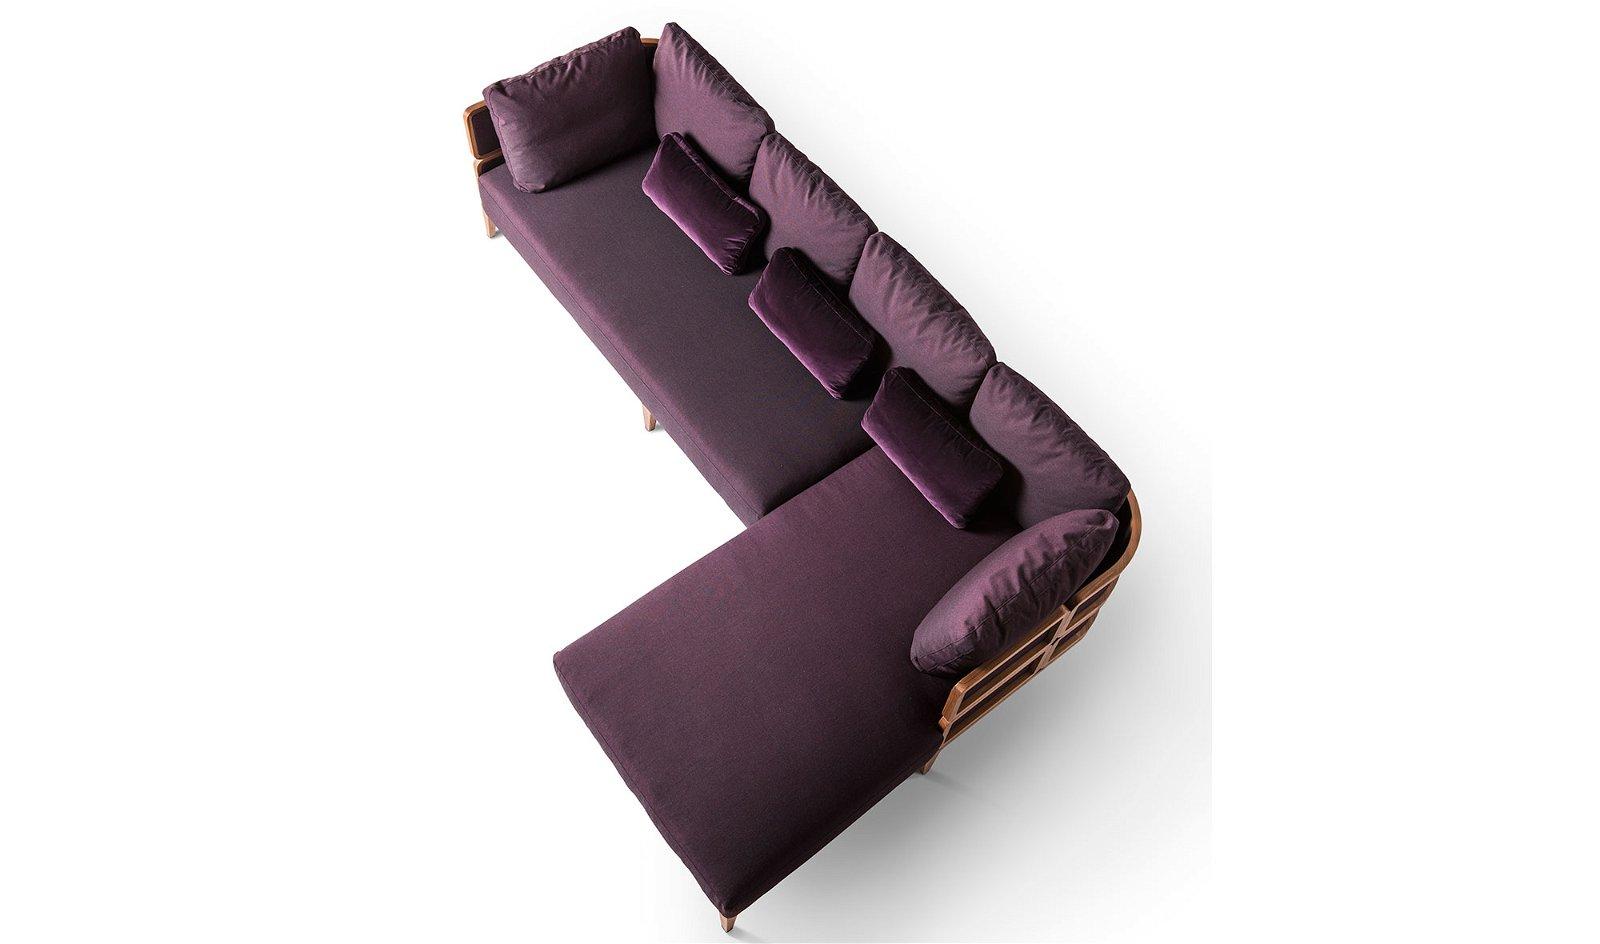 Sofá con chaise longue Gebrüder Thonet Promenade